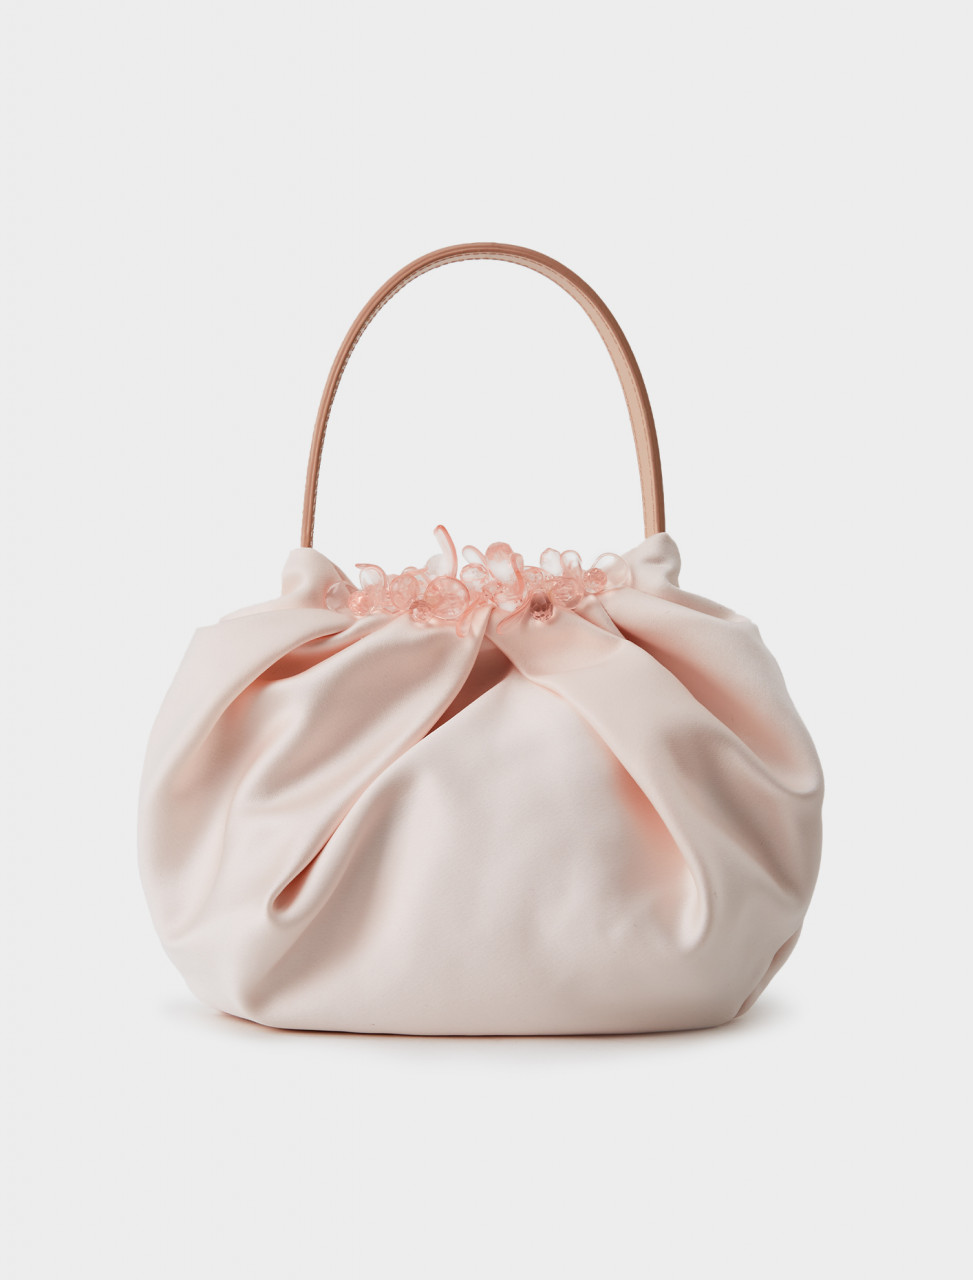 Simone Rocha Satin Mini Pleated Bag in Rose